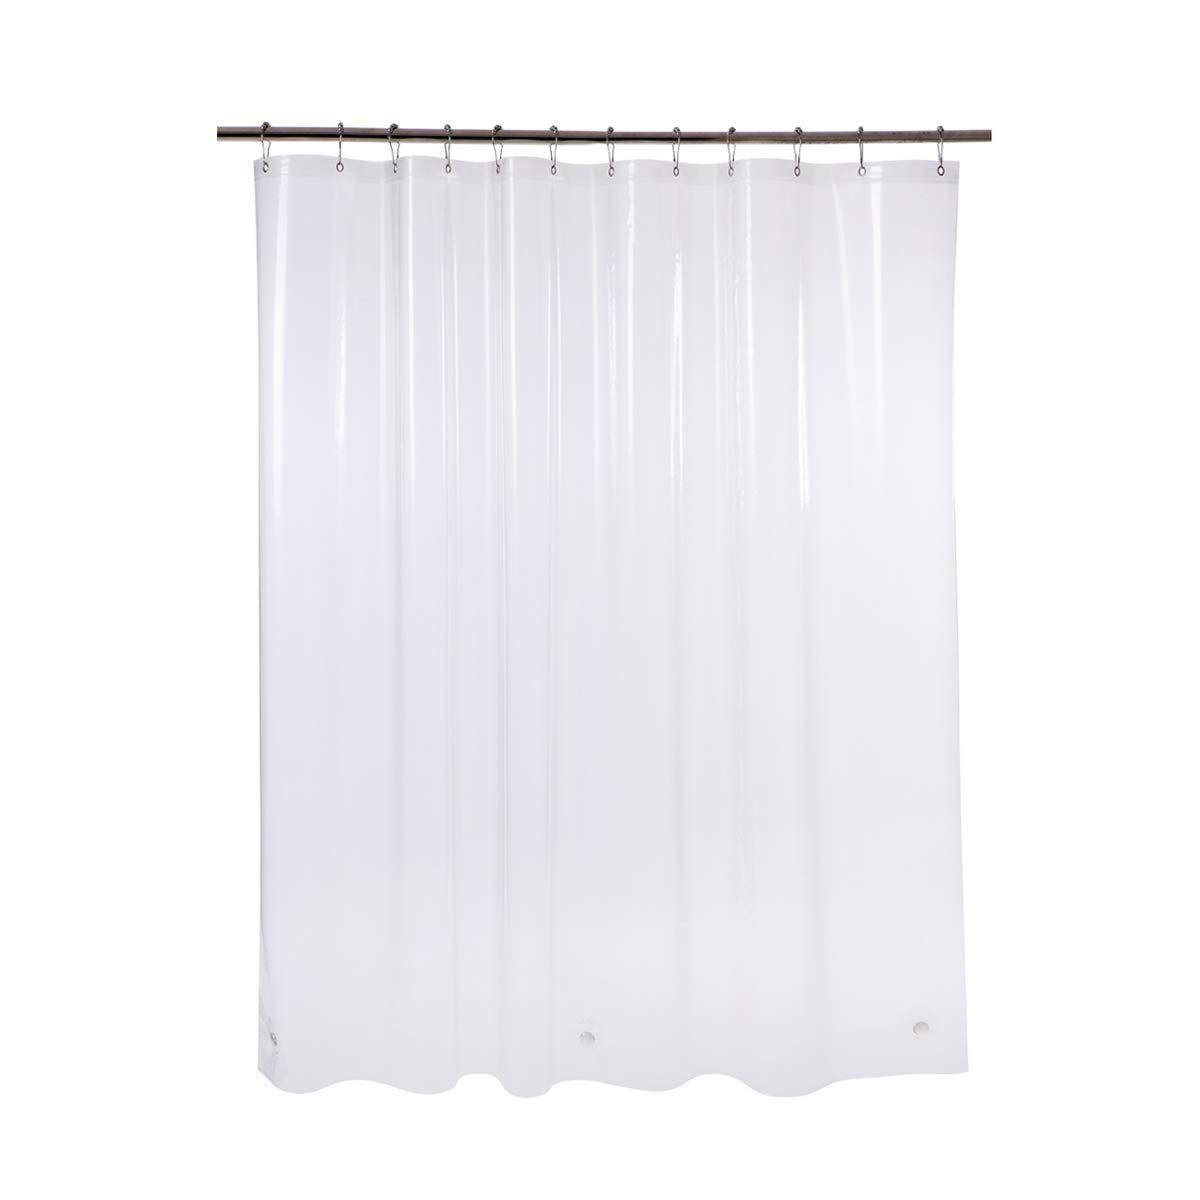 Amazerbath Plastic Shower Curtain 72 Quot W X 65 Quot H Eva 8g Thick Bathroom Shower Curtains No Smell With H Shower Curtain Plastic Shower Curtain Curtains